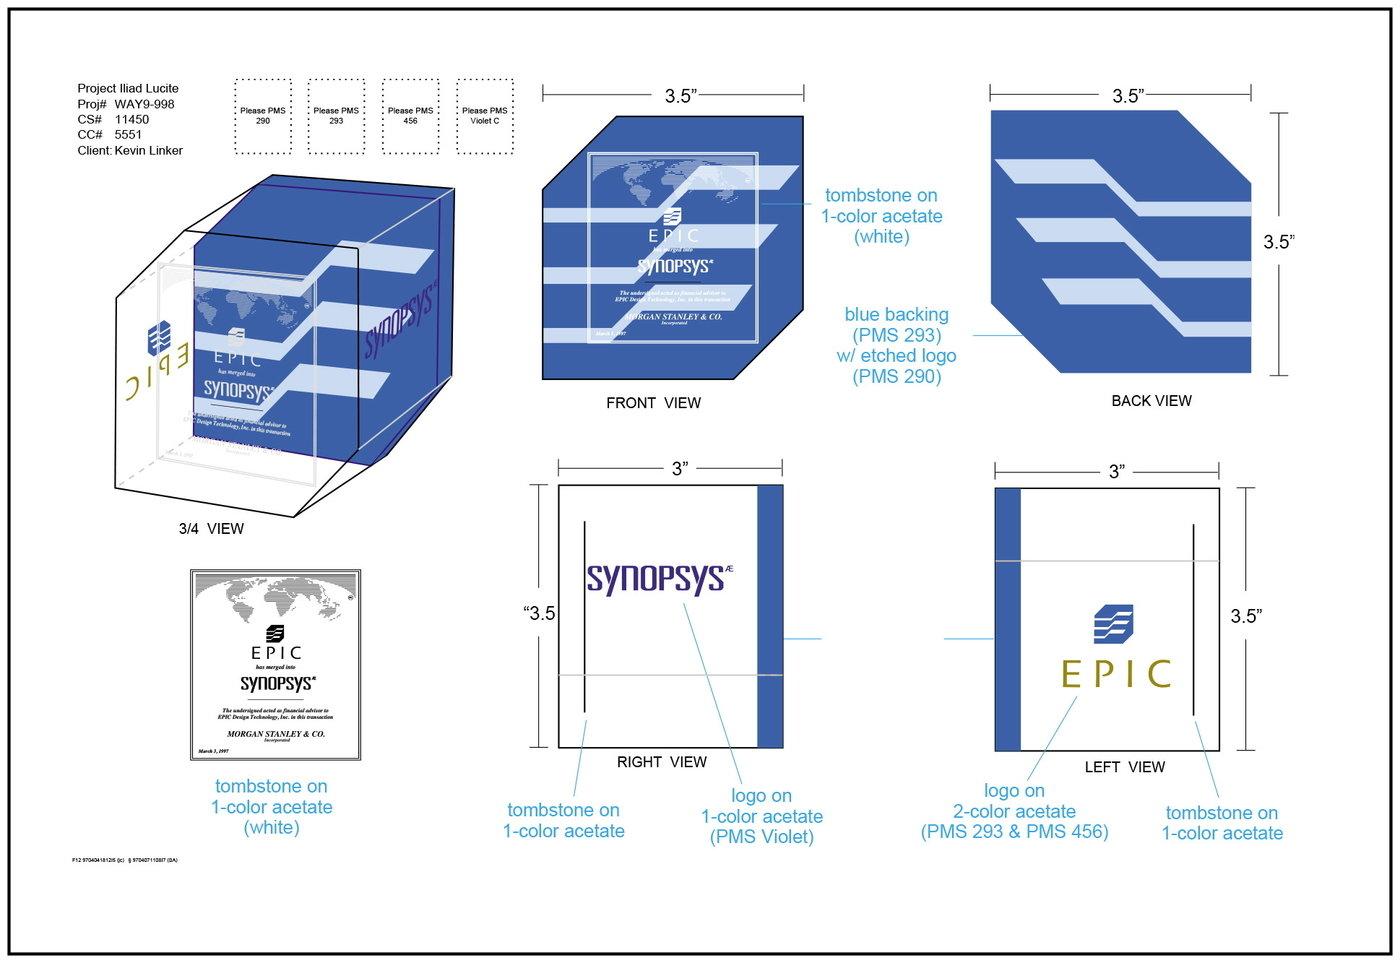 Morgan Stanley Creative Services by Steven Adams at Coroflot com